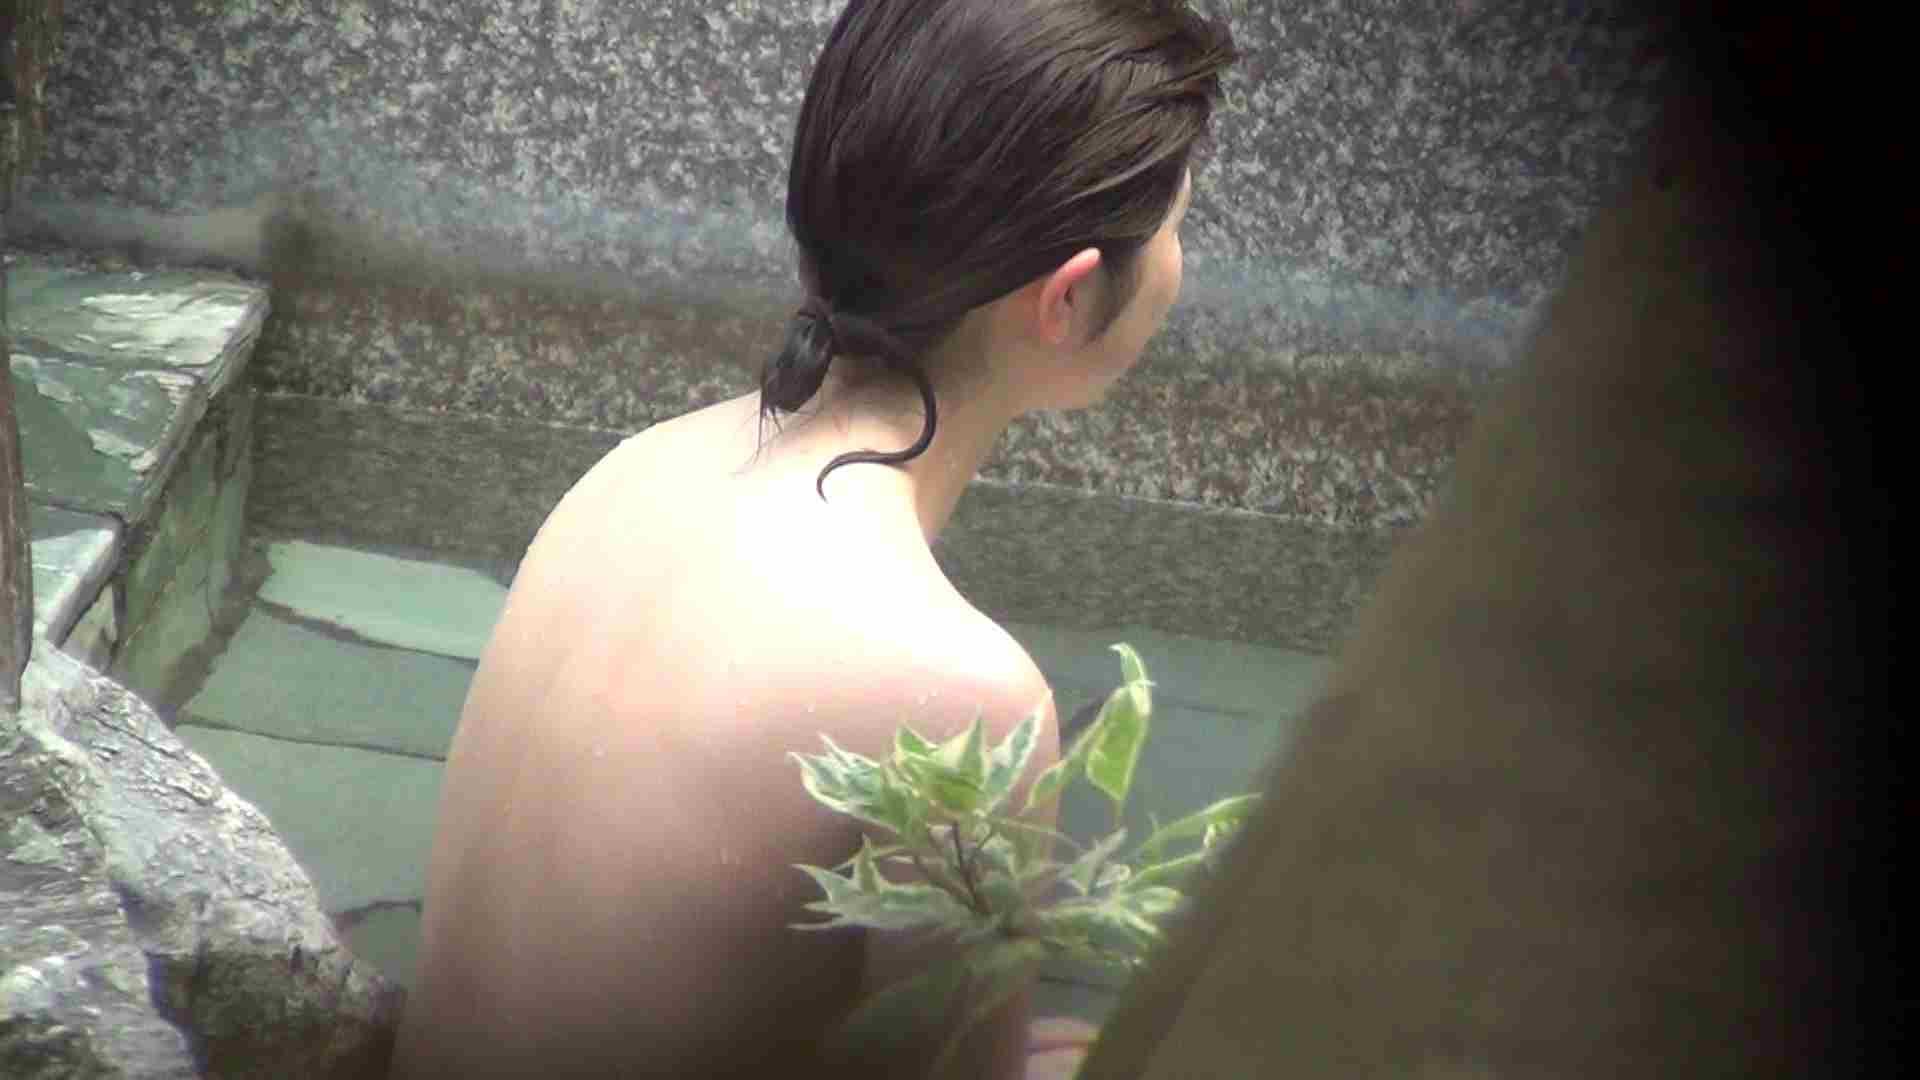 Aquaな露天風呂Vol.262 HなOL | 盗撮  73pic 66